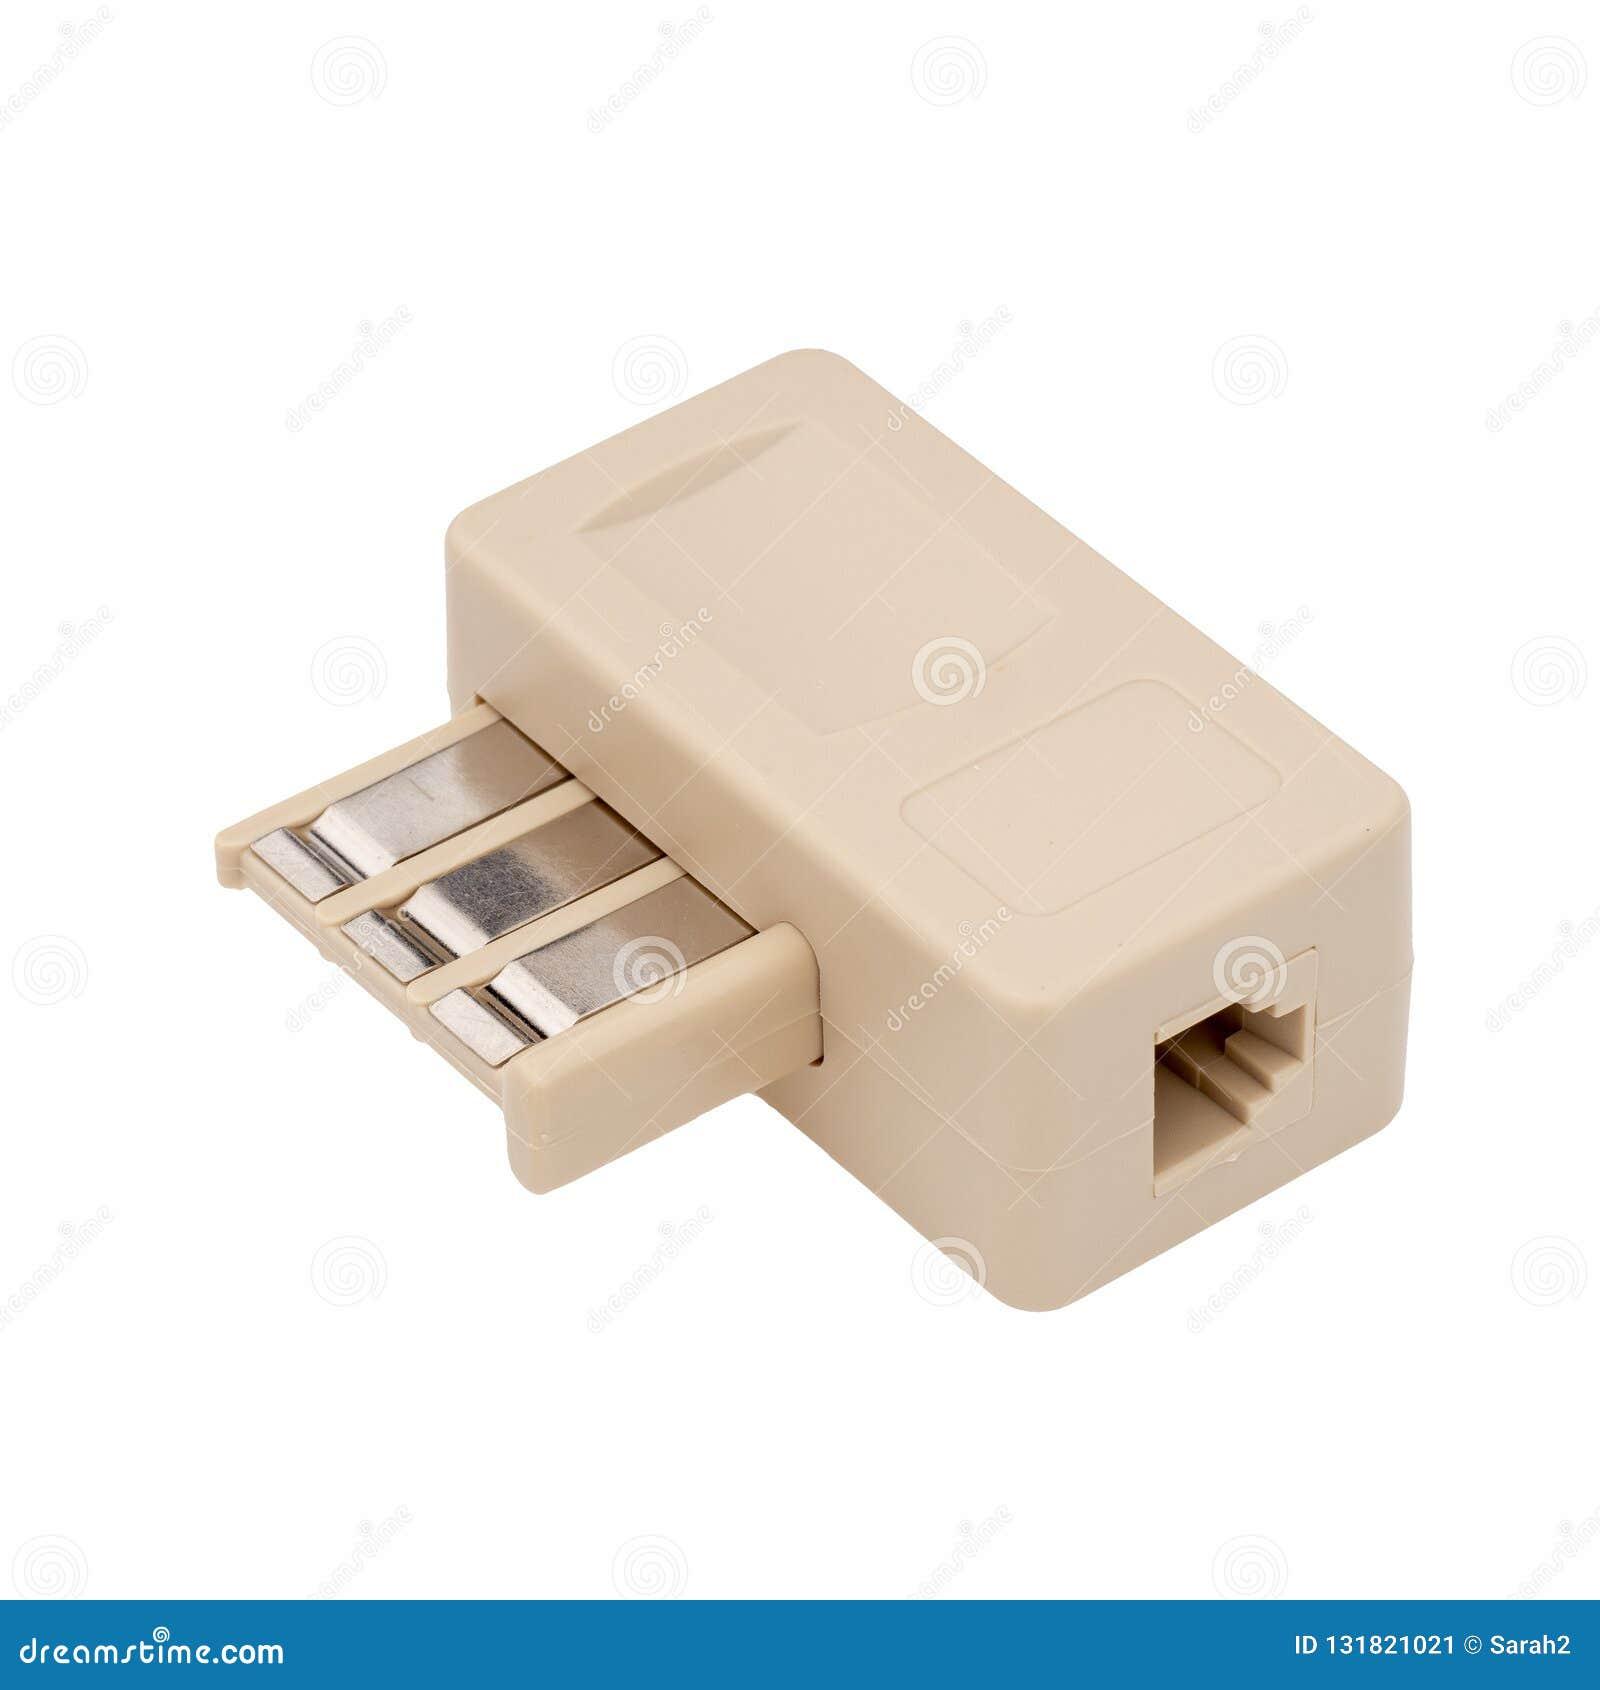 Phone Adapter Landline Plug France French. Technology connector. Jack. Isolated on white.